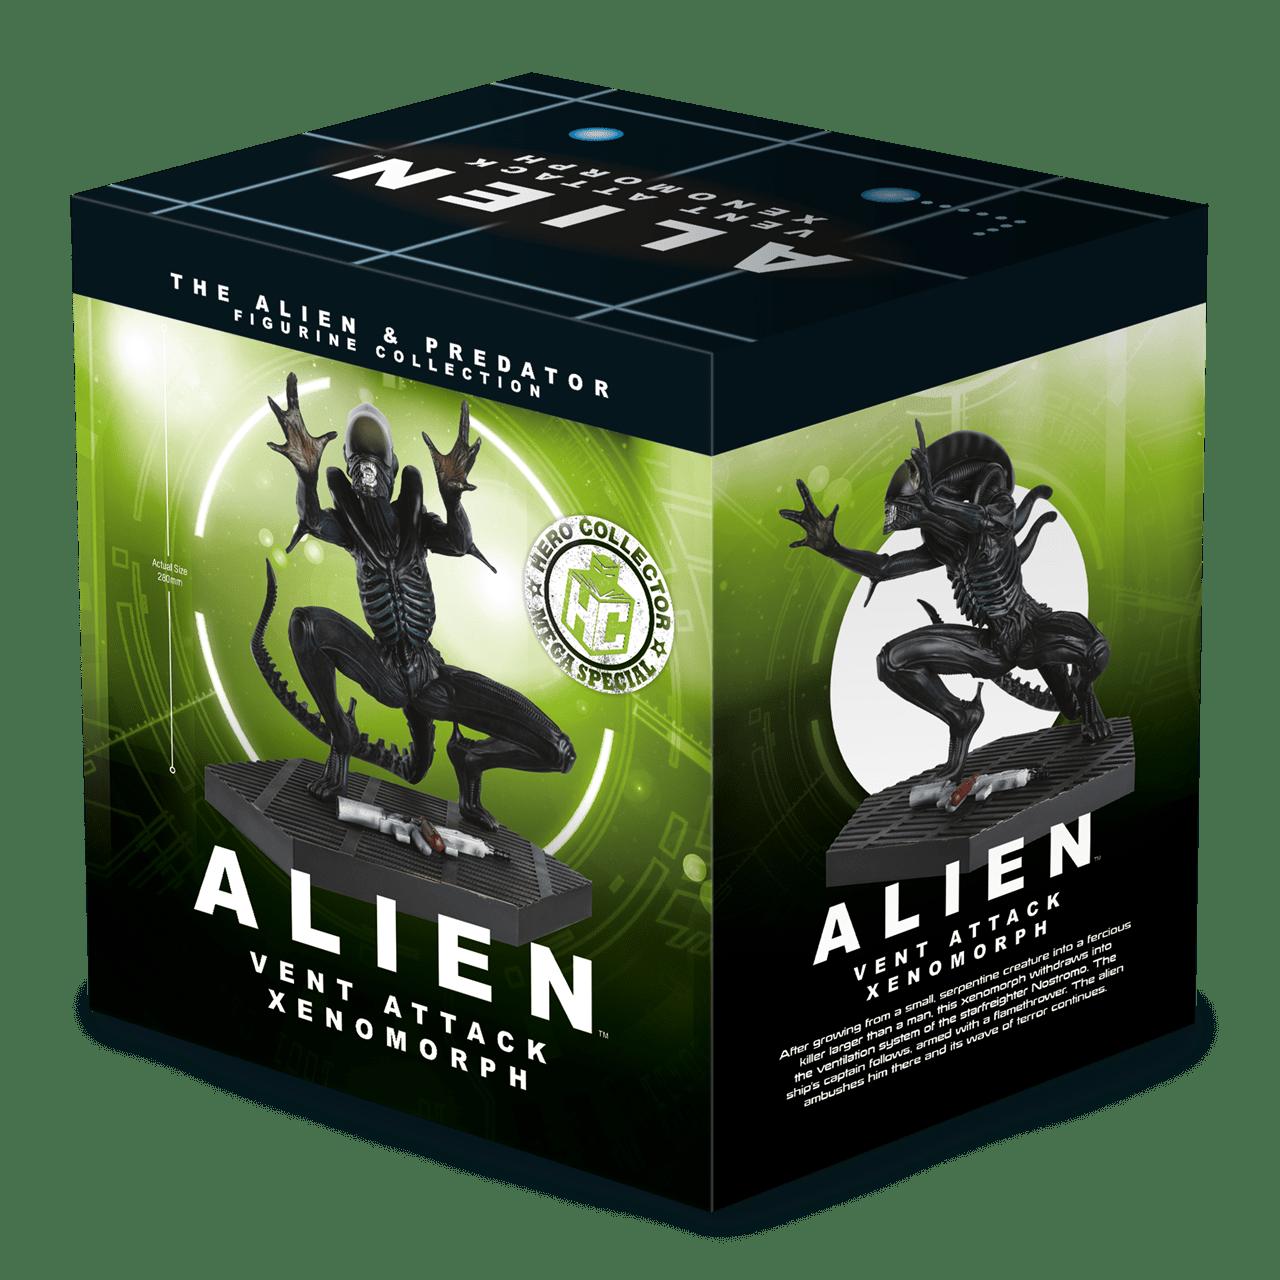 Alien: Vent Attack Mega Figurine: Hero Collector - 6